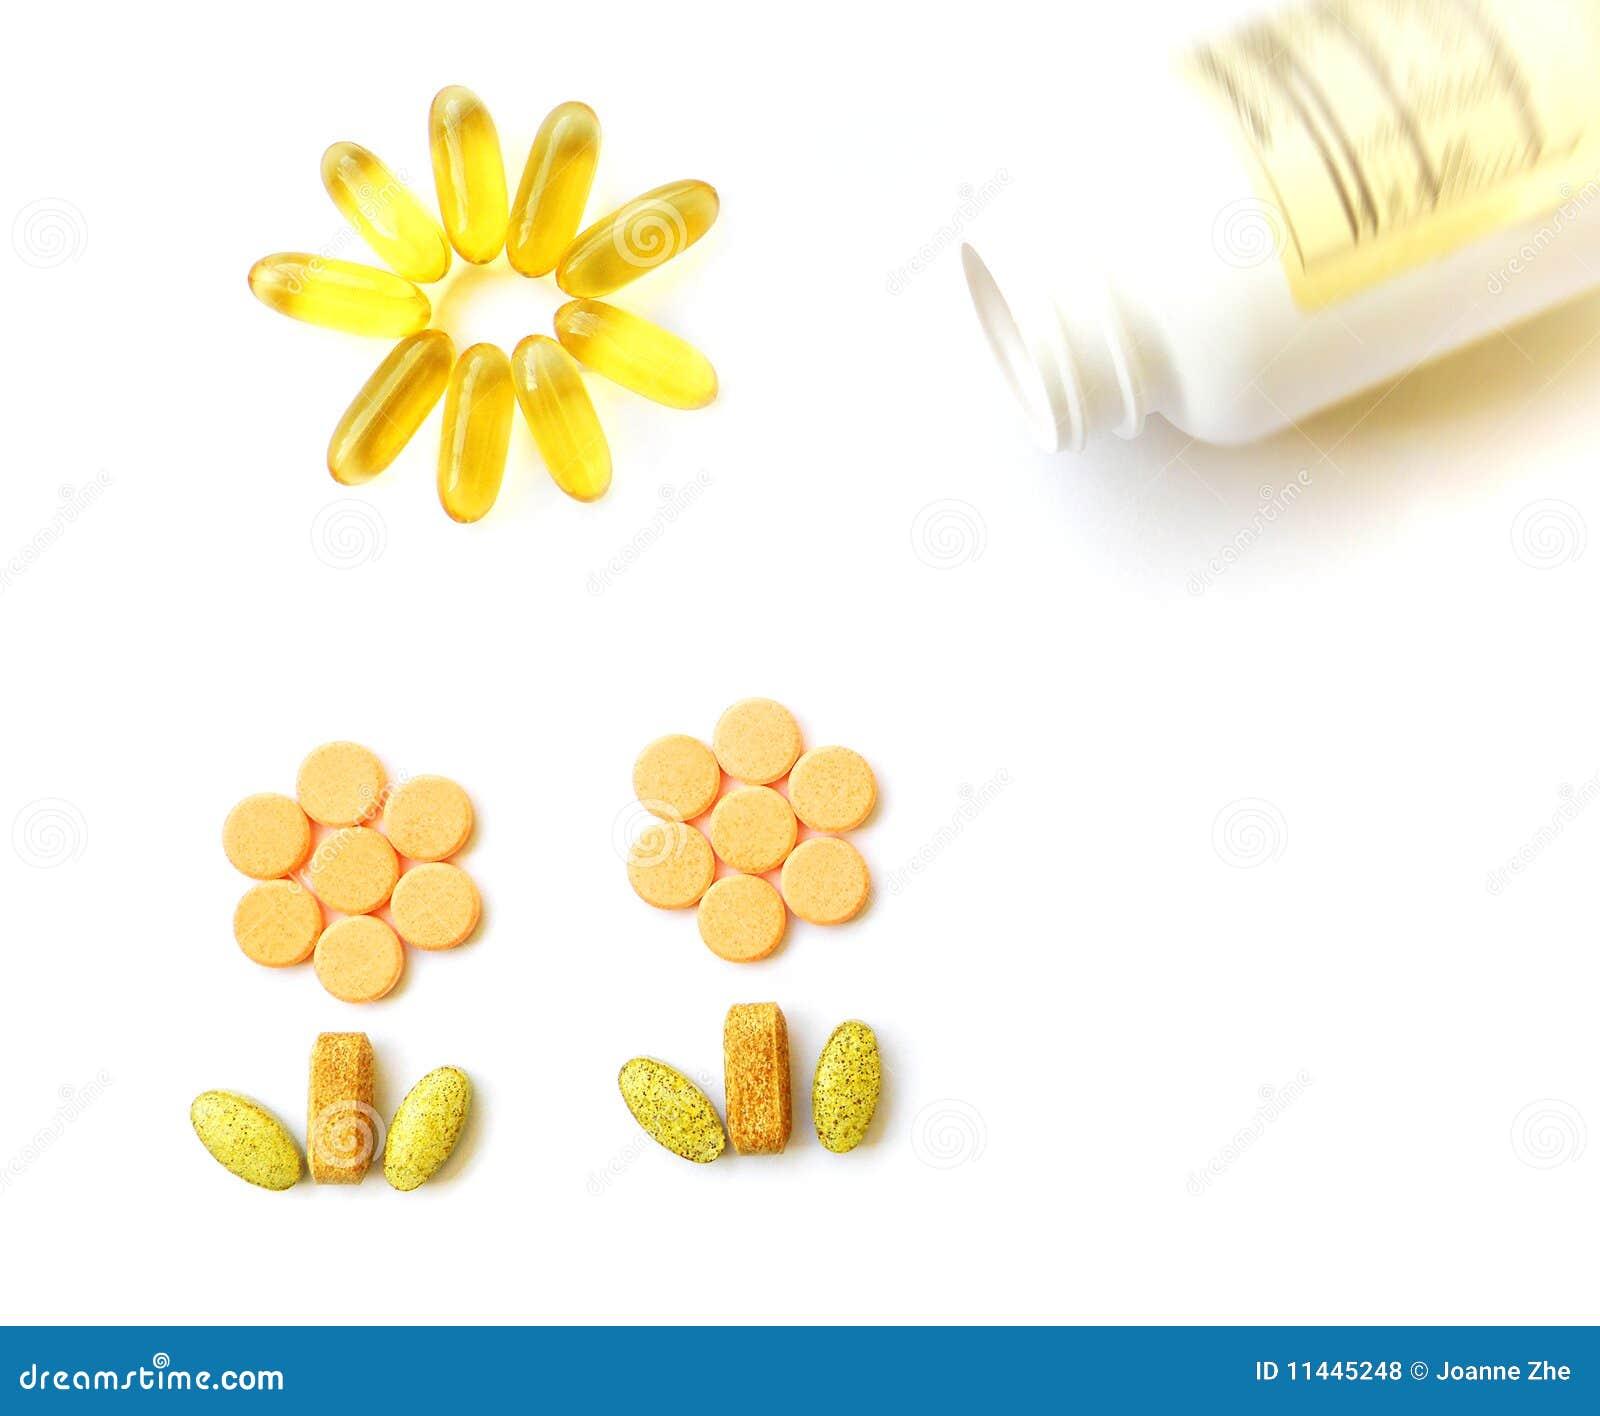 Suplementos às vitaminas para a saúde